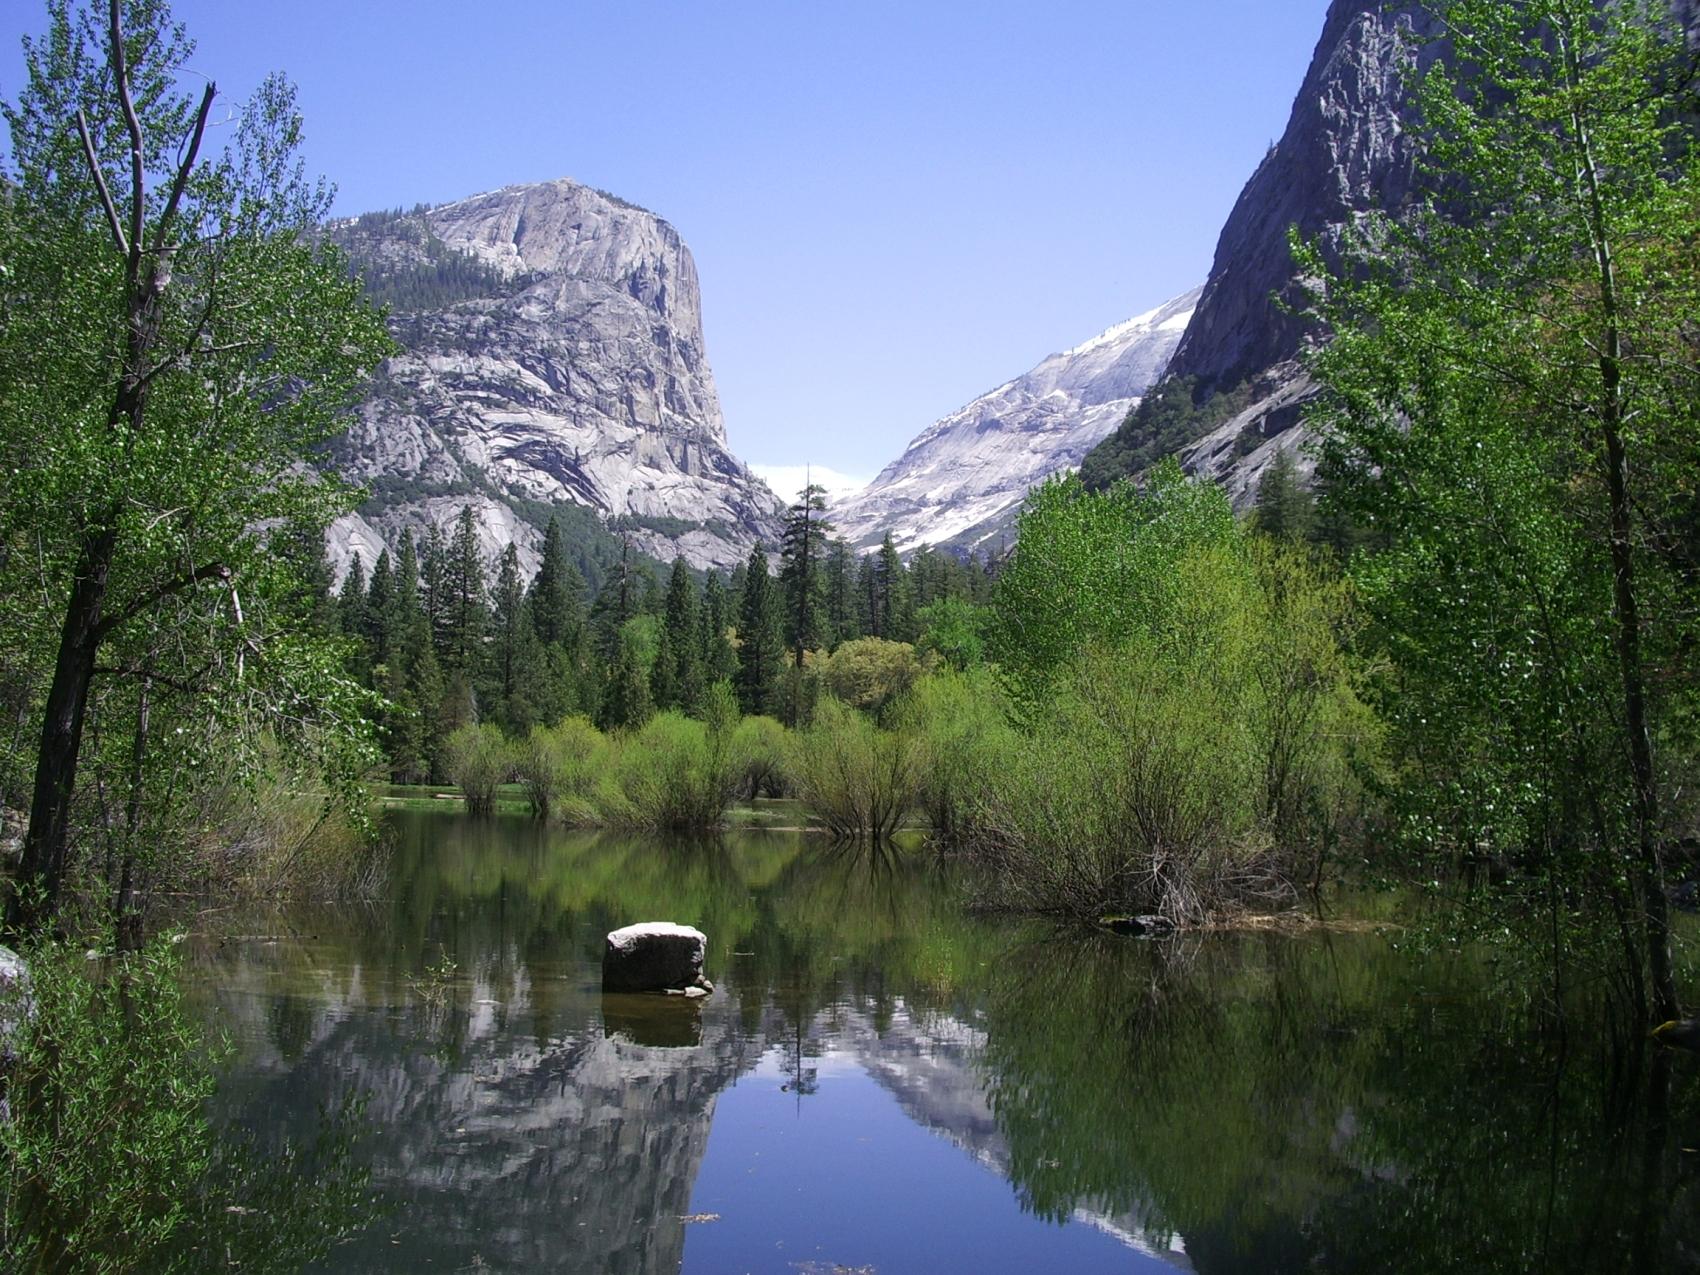 Yosemite Wallpaper   FREE DOWNLOAD HD WALLPAPERS 1700x1275